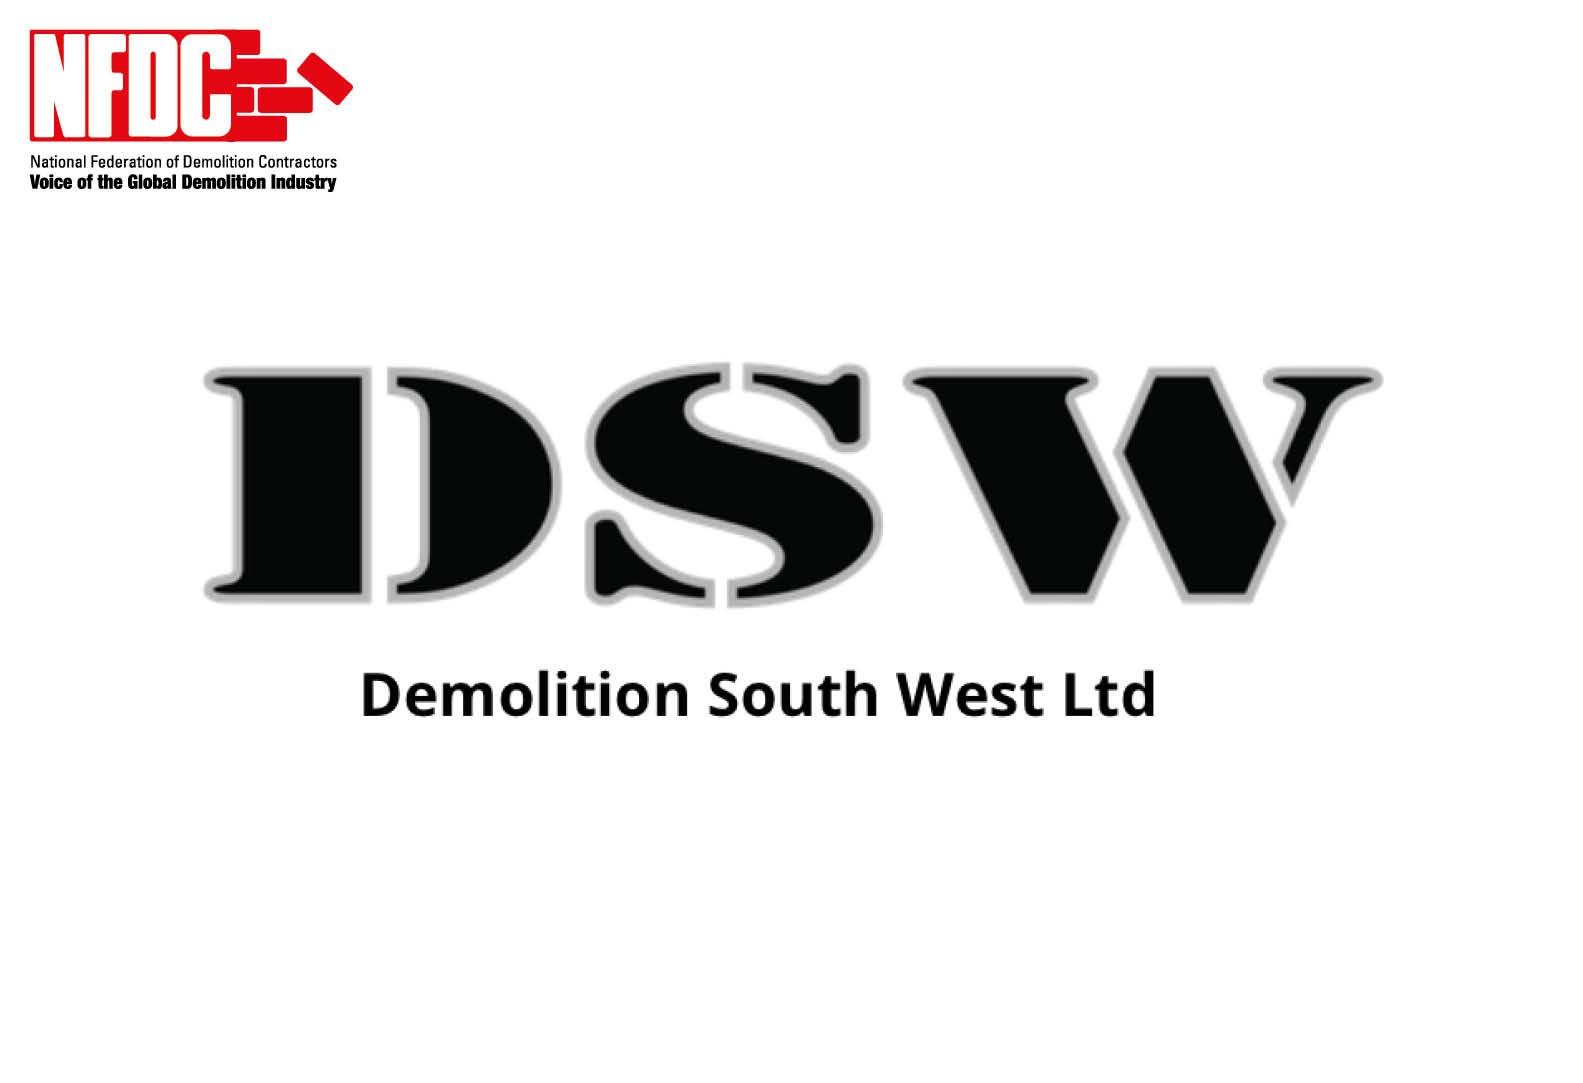 Demolition South West